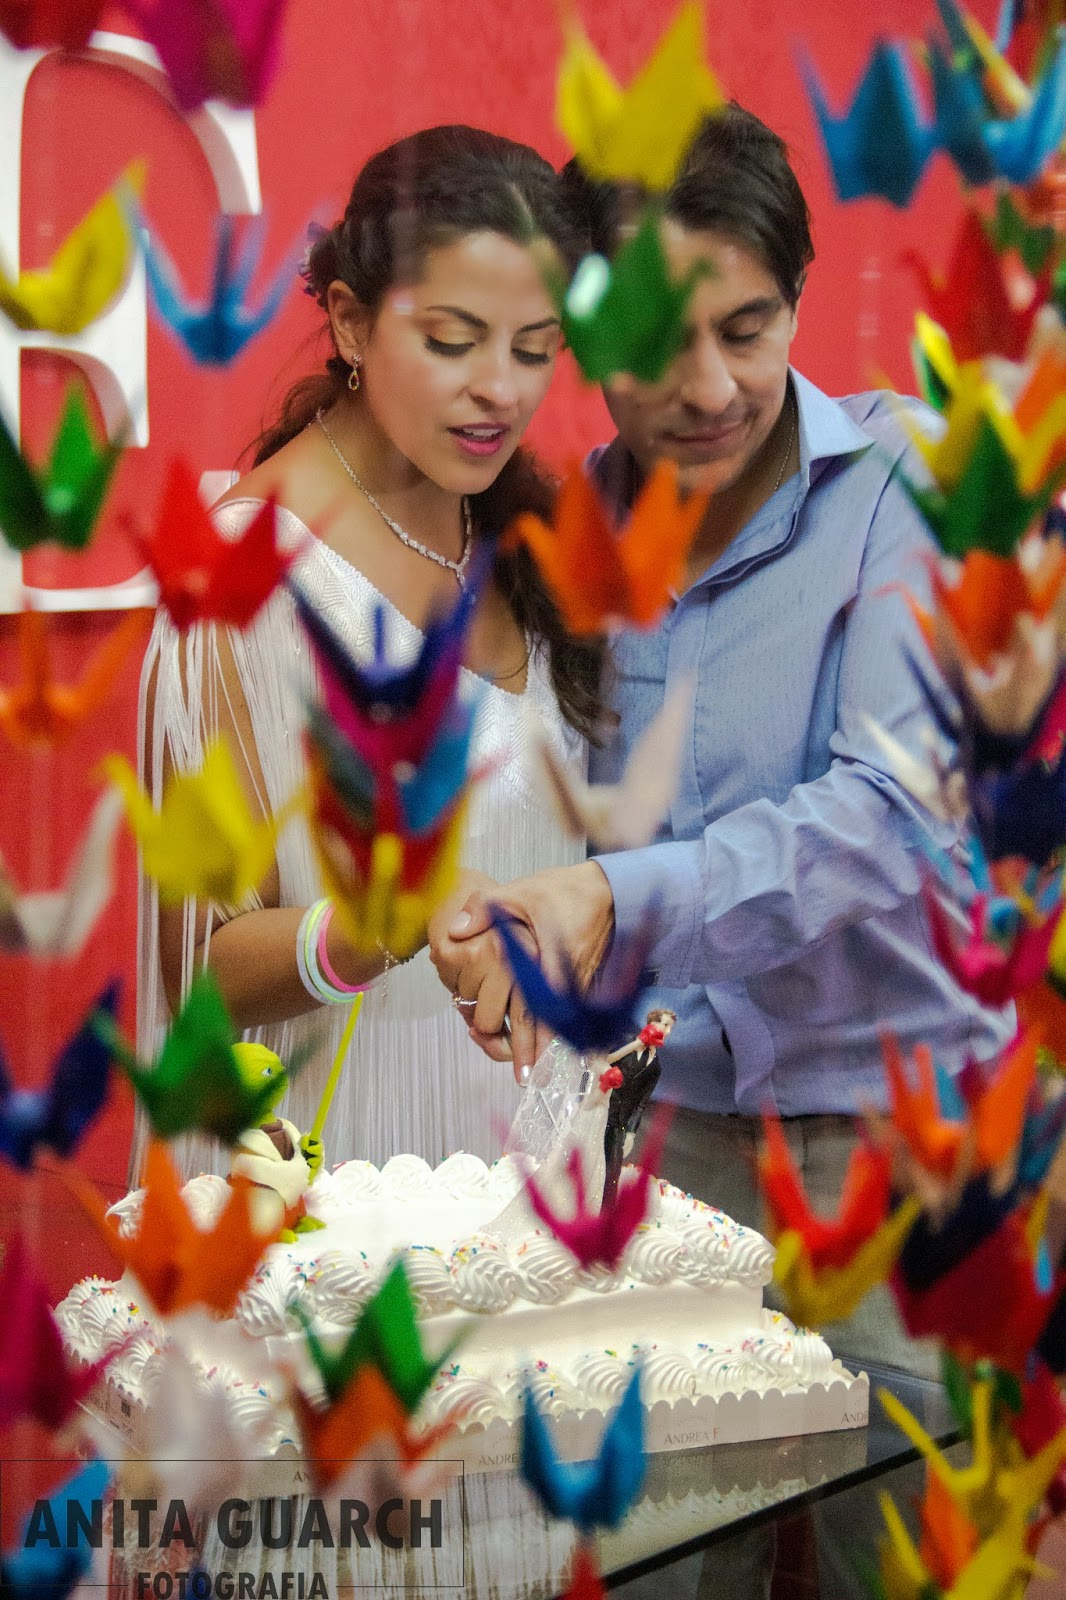 boda,casamiento,eventos,foto,fotografia,profesional,cordoba,argentina,raphaeleventos,civil,iglesia,pre-boda,weddin